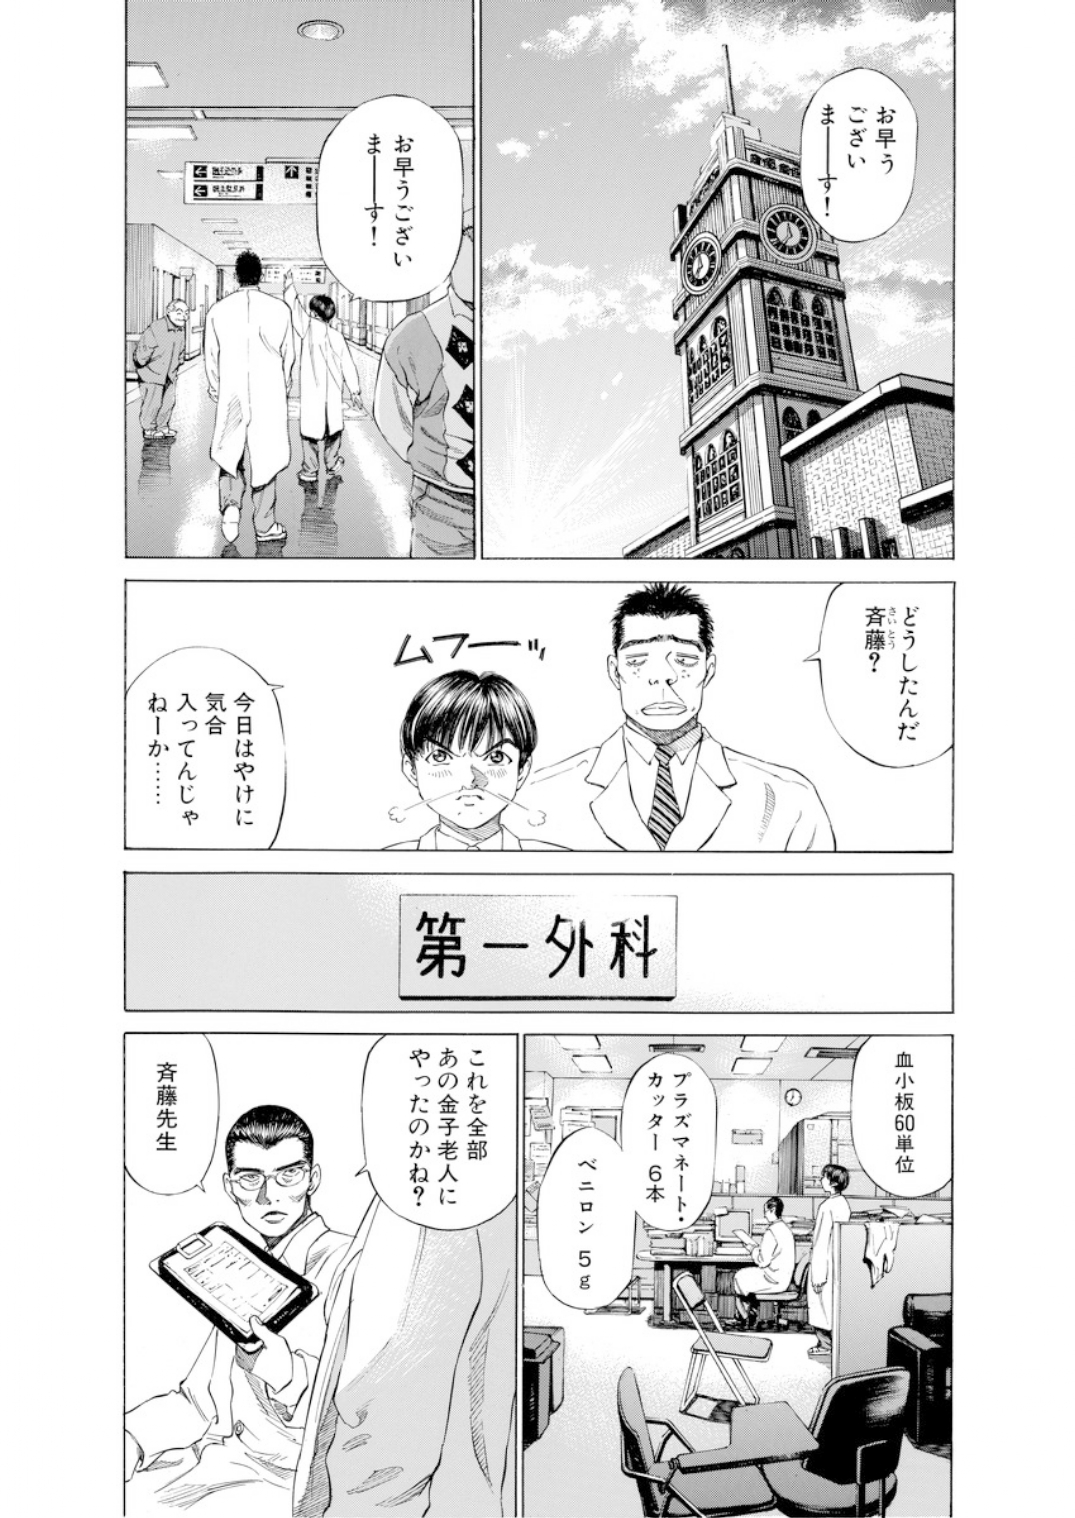 001bj_page-0089.jpg